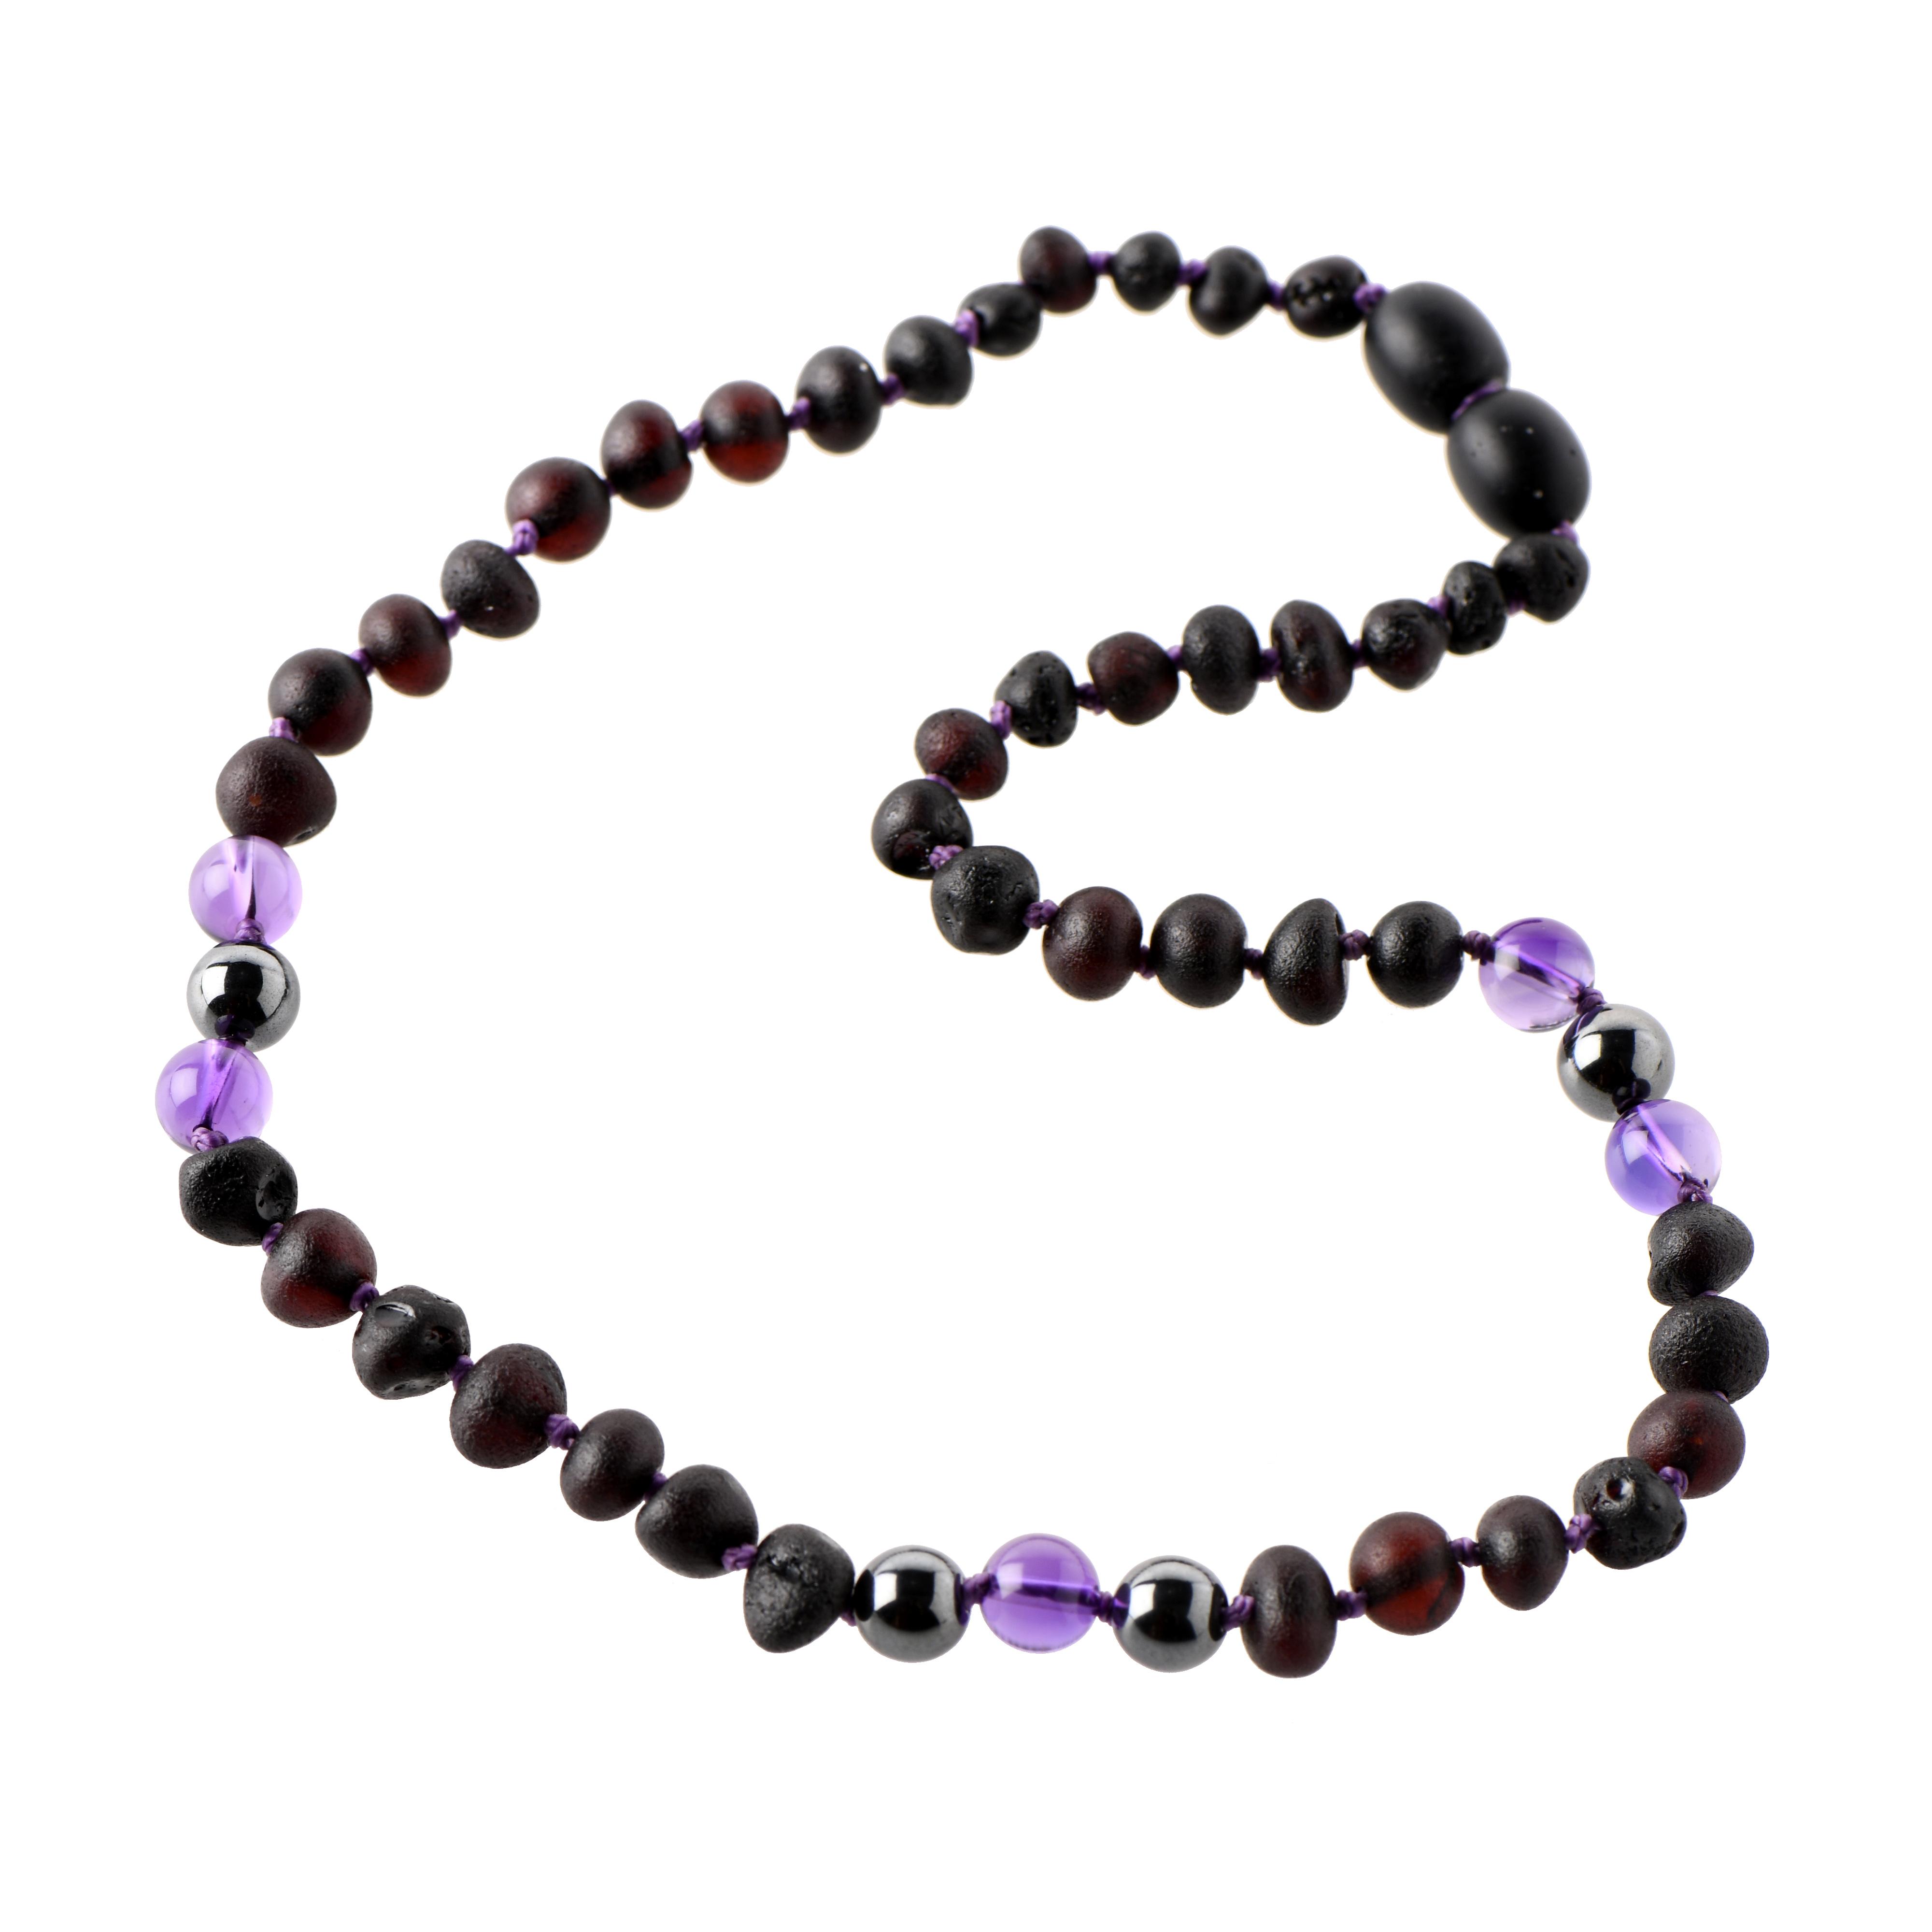 Amber Hematite Necklace